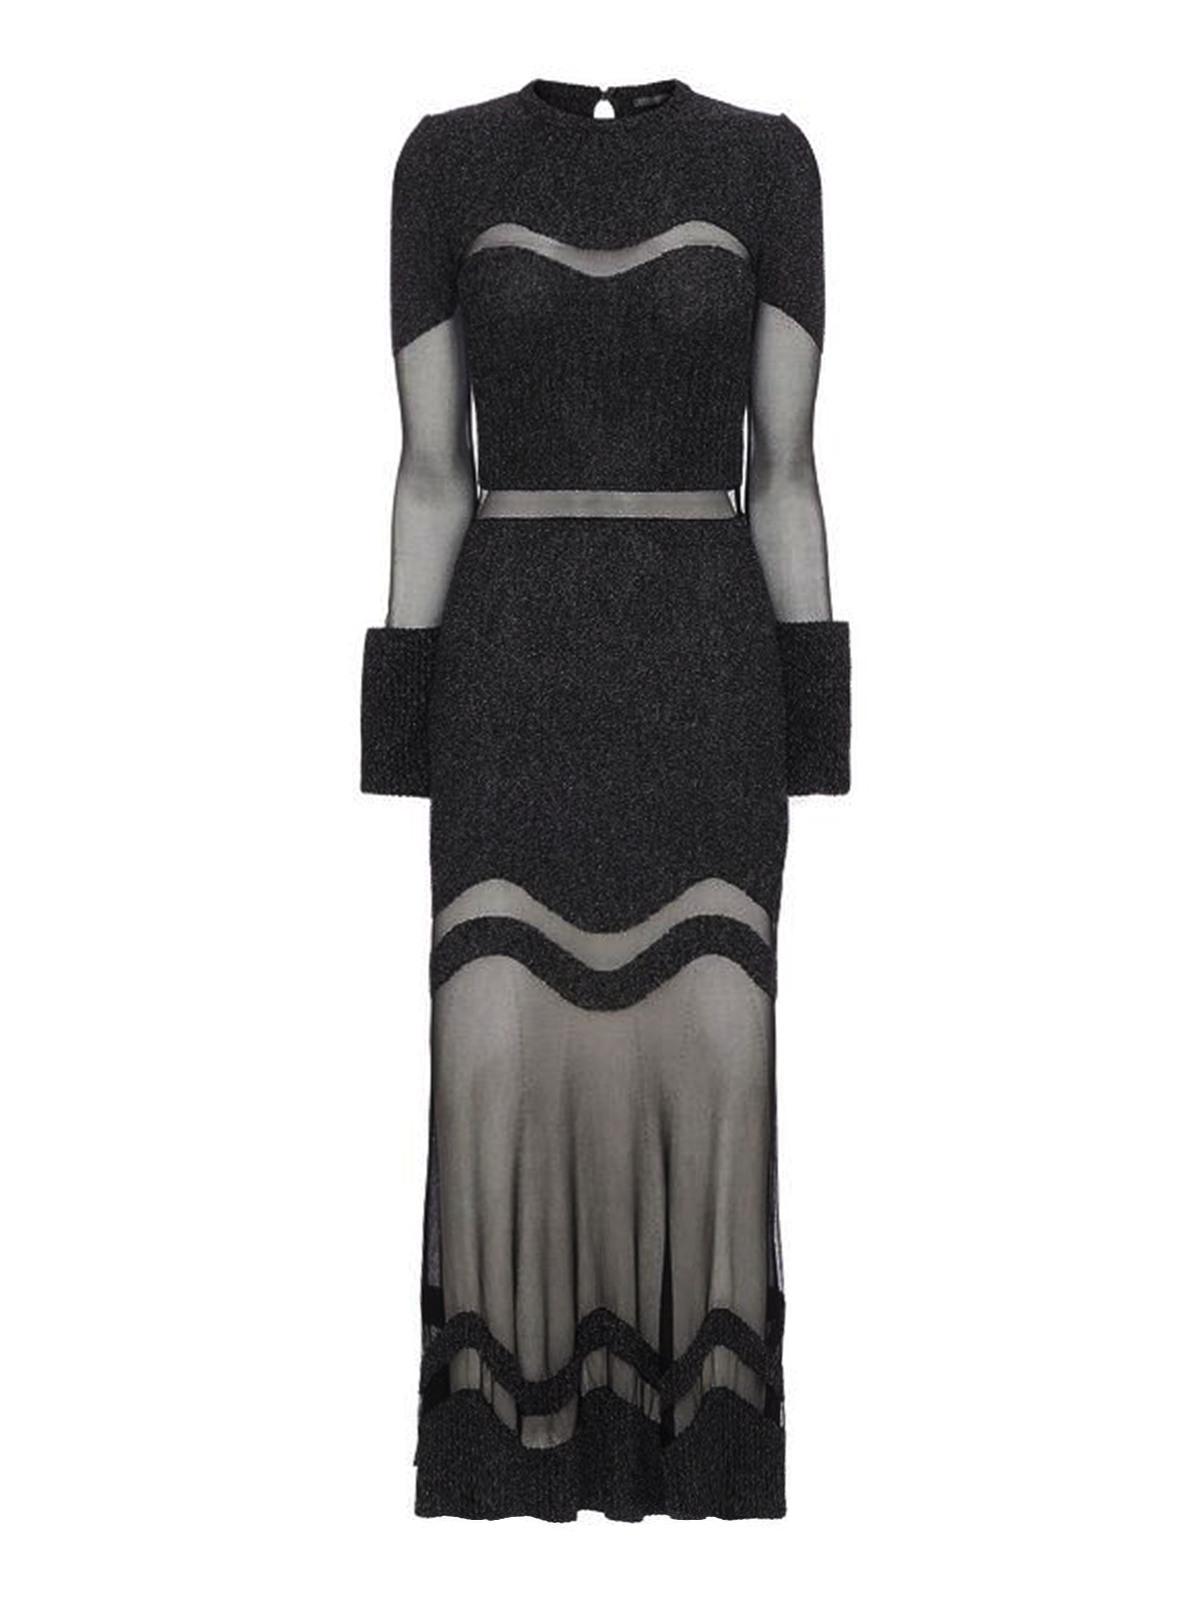 Spektakulär Alexander Mc Queen Abendkleid DesignAbend Luxus Alexander Mc Queen Abendkleid Boutique